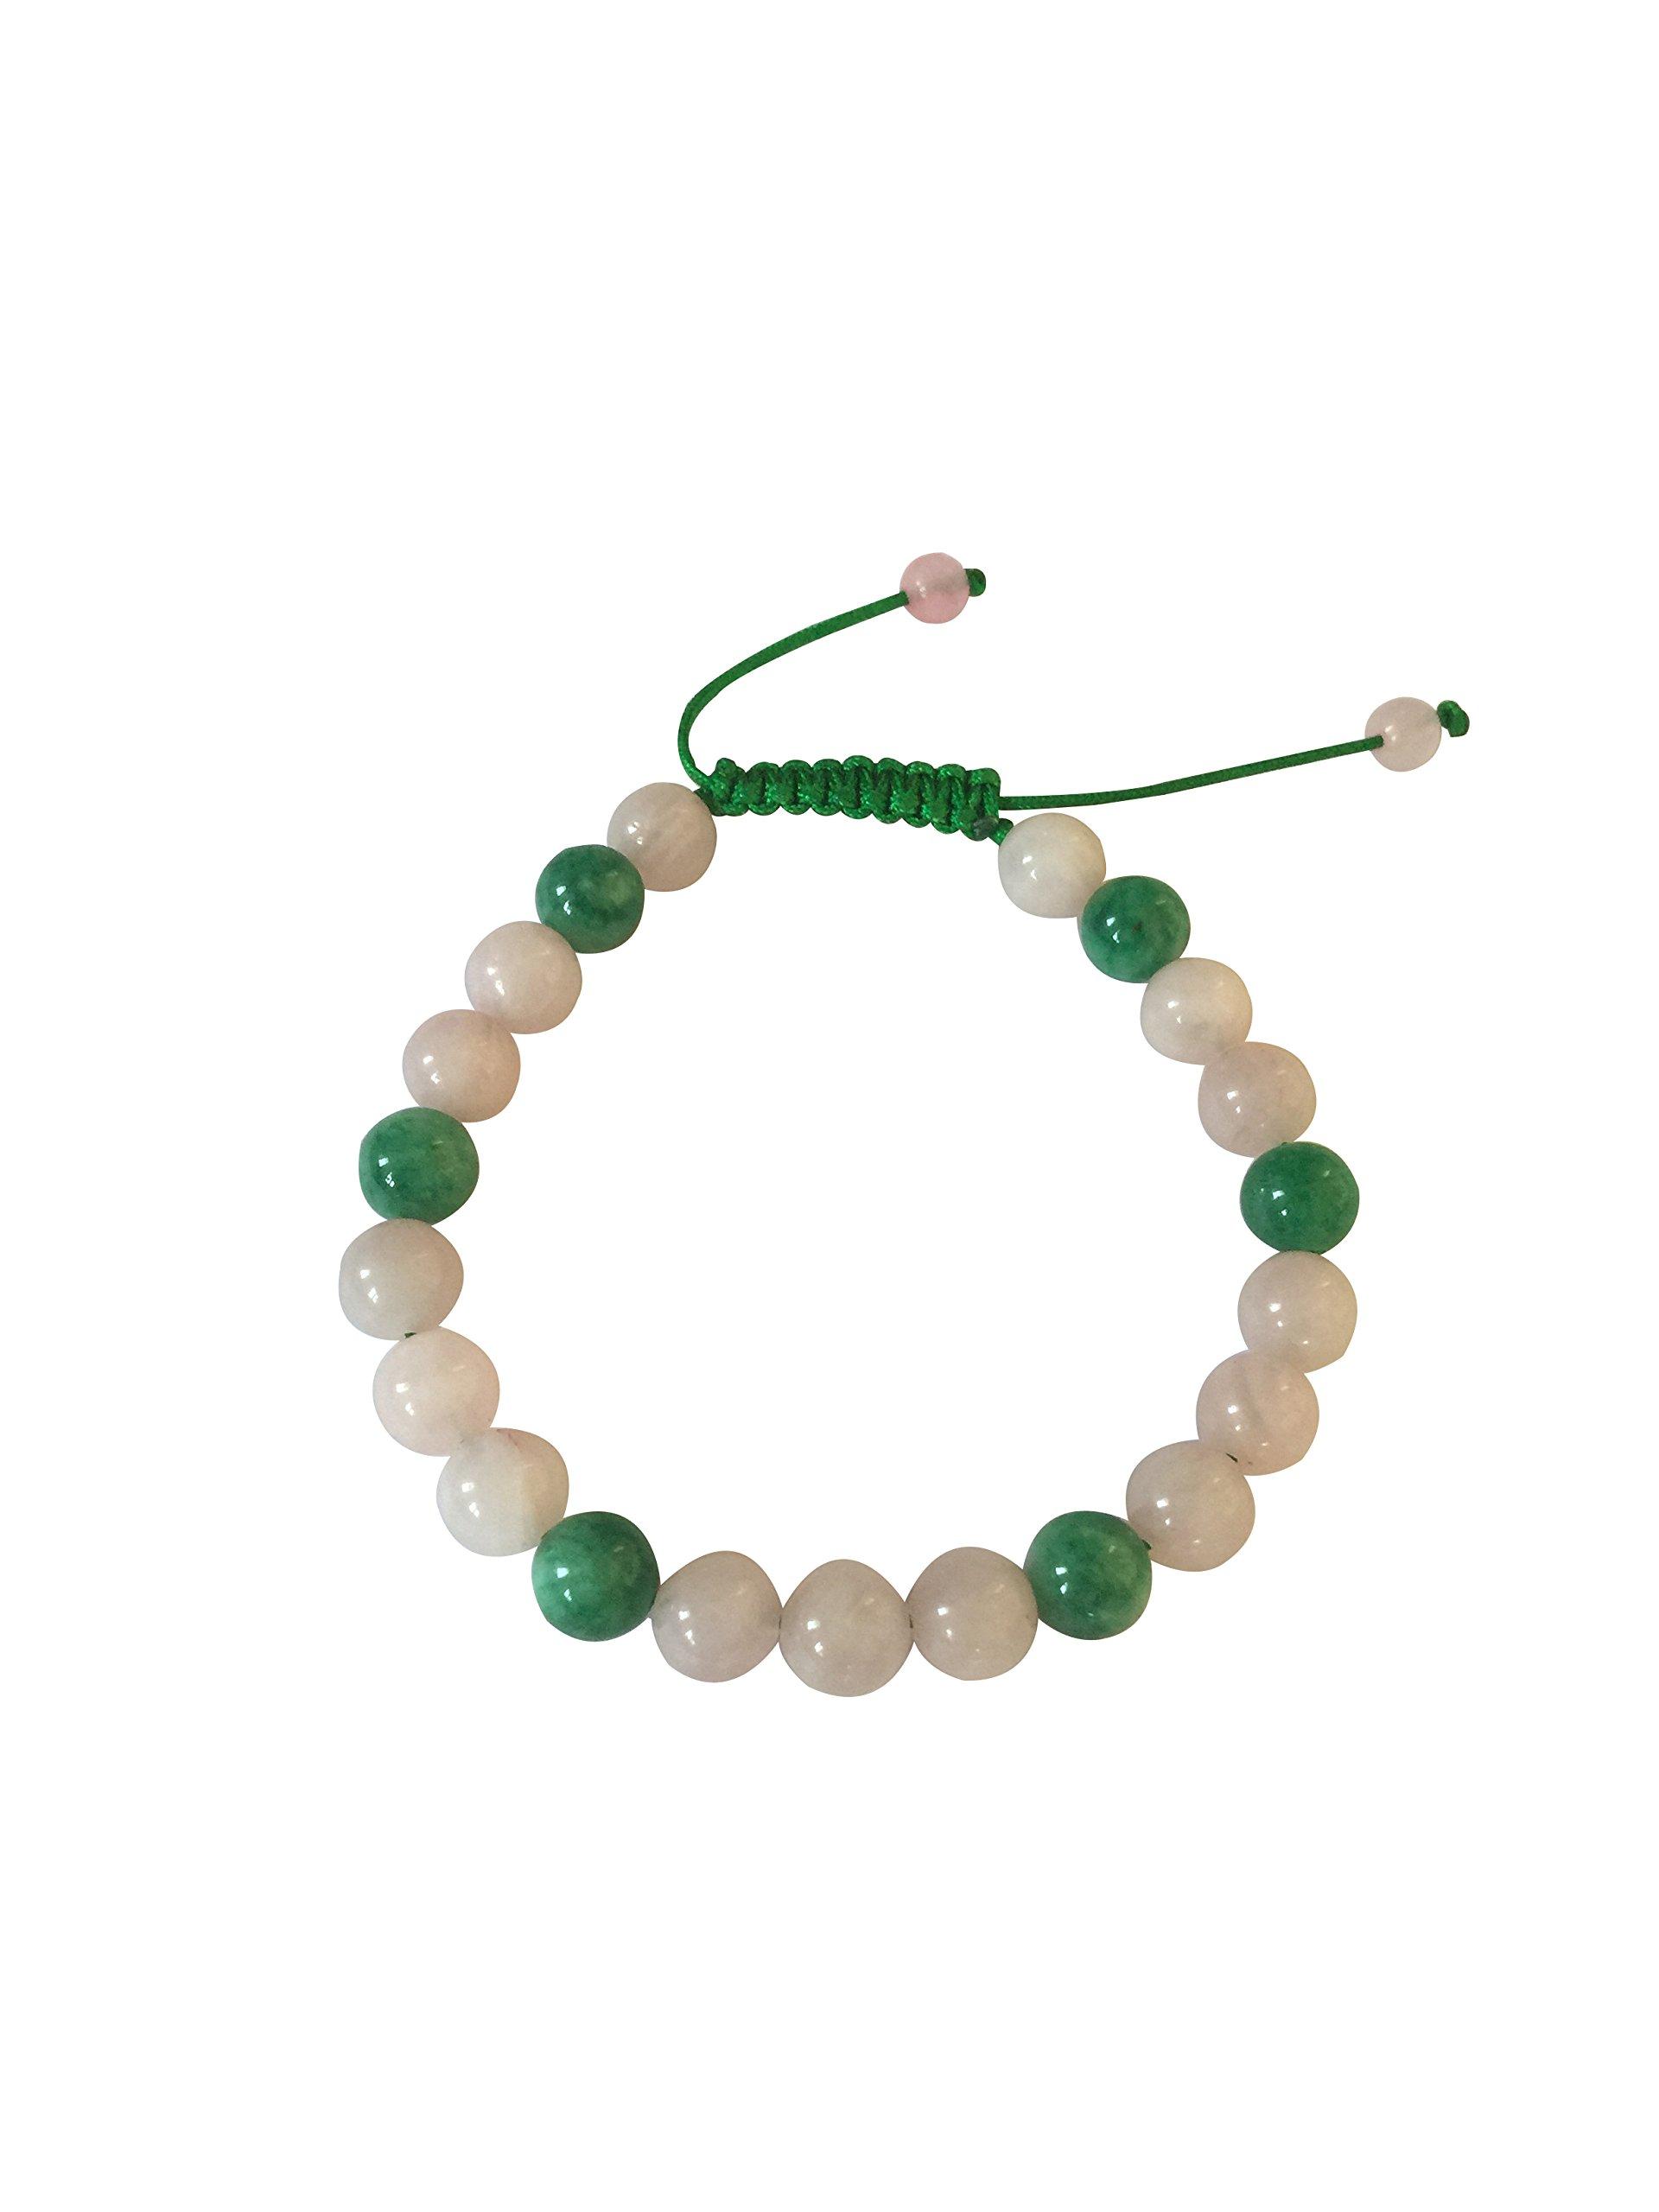 Tibetan Mala Rose Quartz and Green Jade Agate Wrist Mala Yoga Bracelet for Meditation